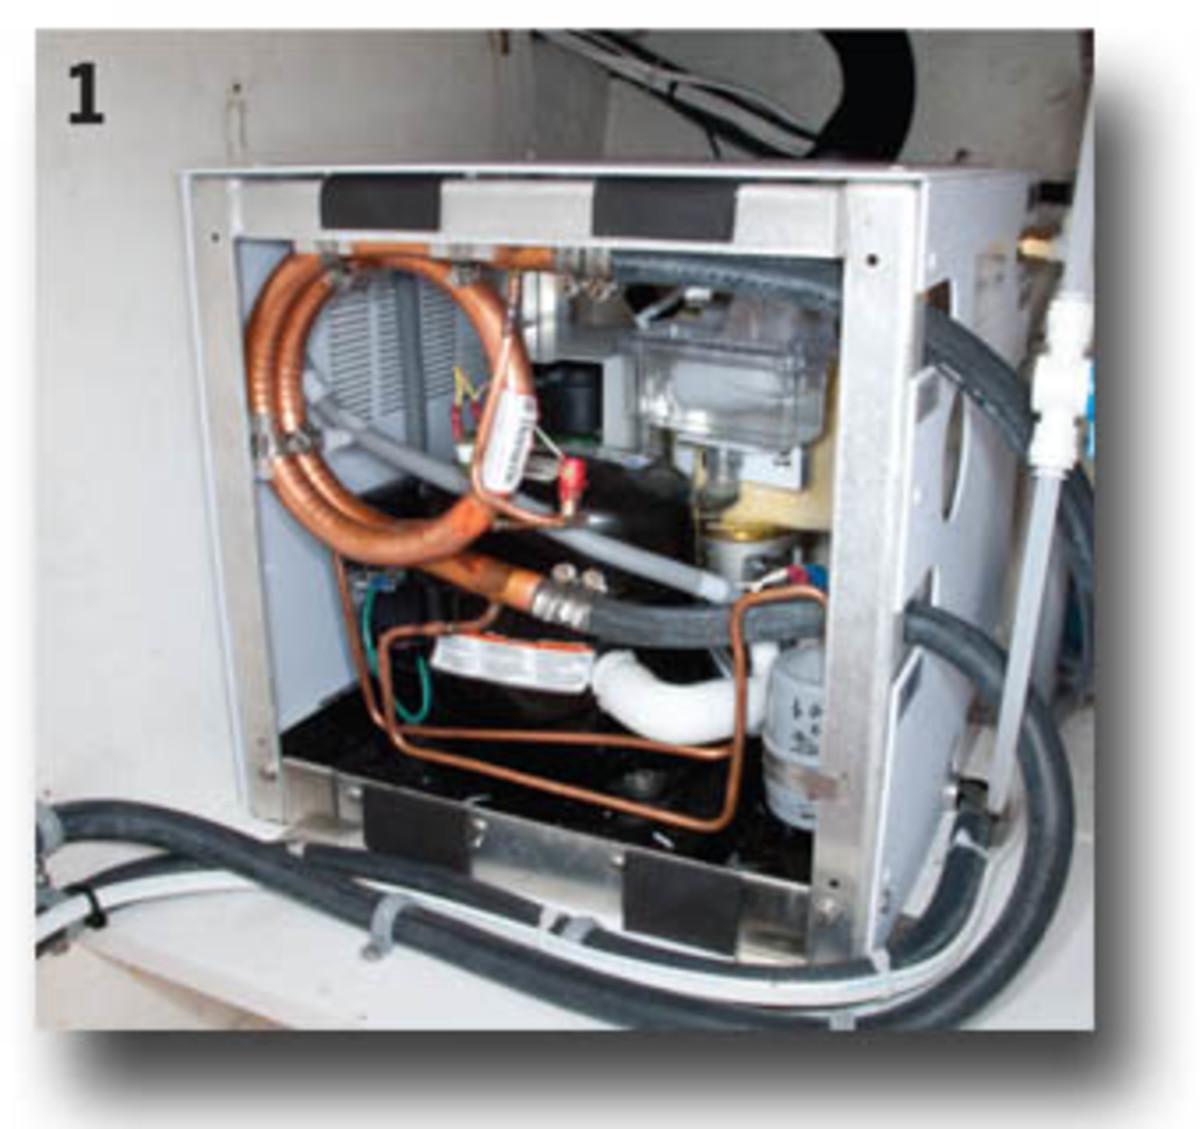 Installing An Ice Maker - 1